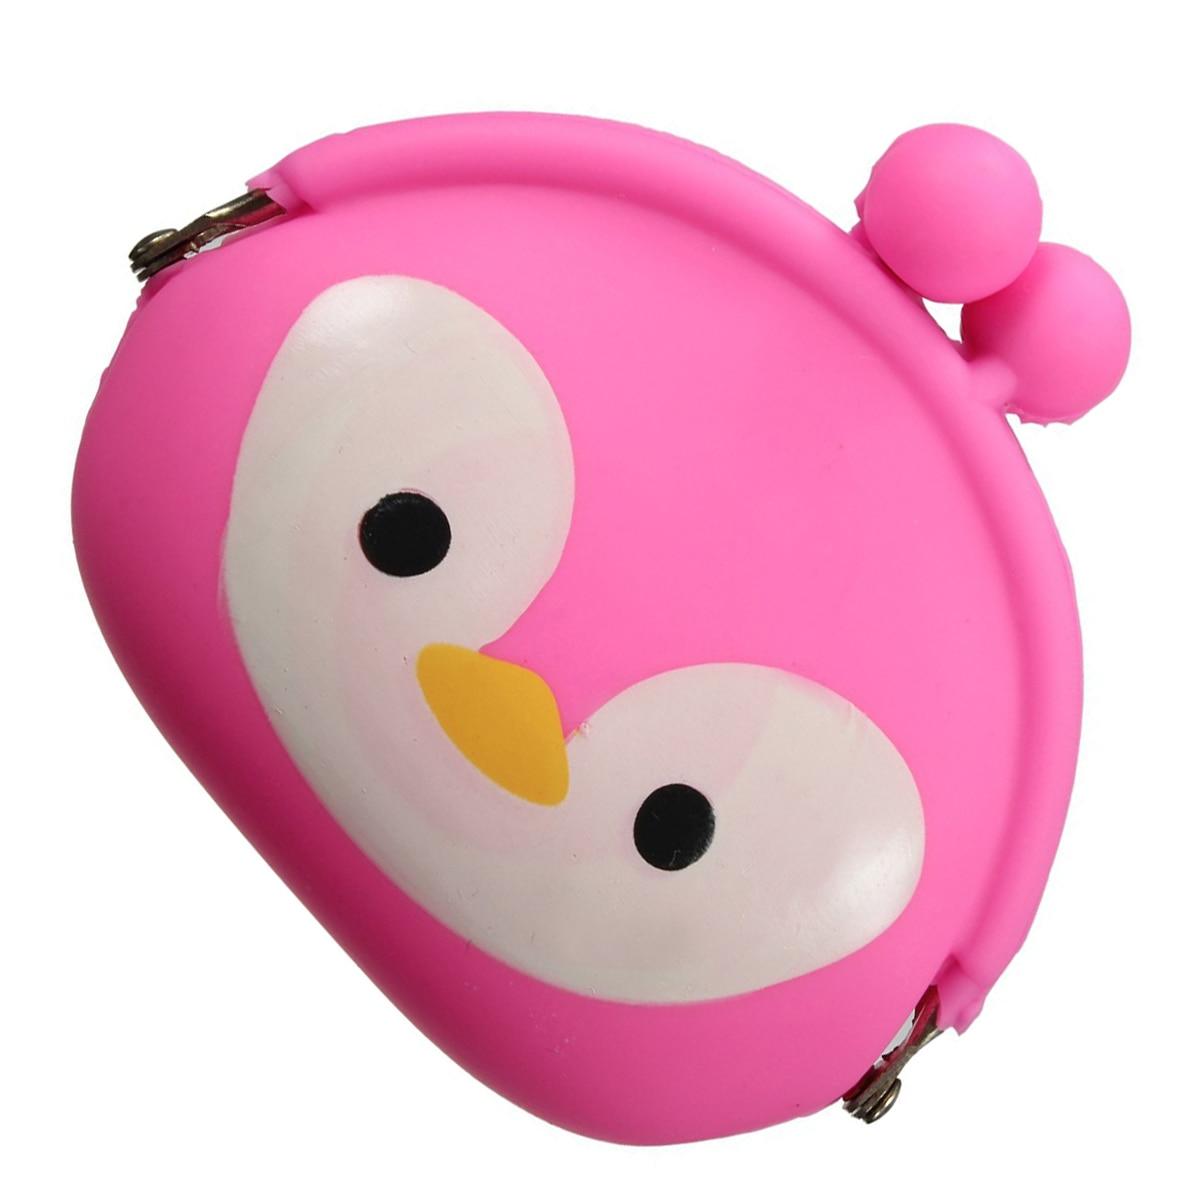 -Women Girls Wallet Kawaii Cute Cartoon Animal Silicone Jelly Coin Bag Purse Kids Gift Penguin